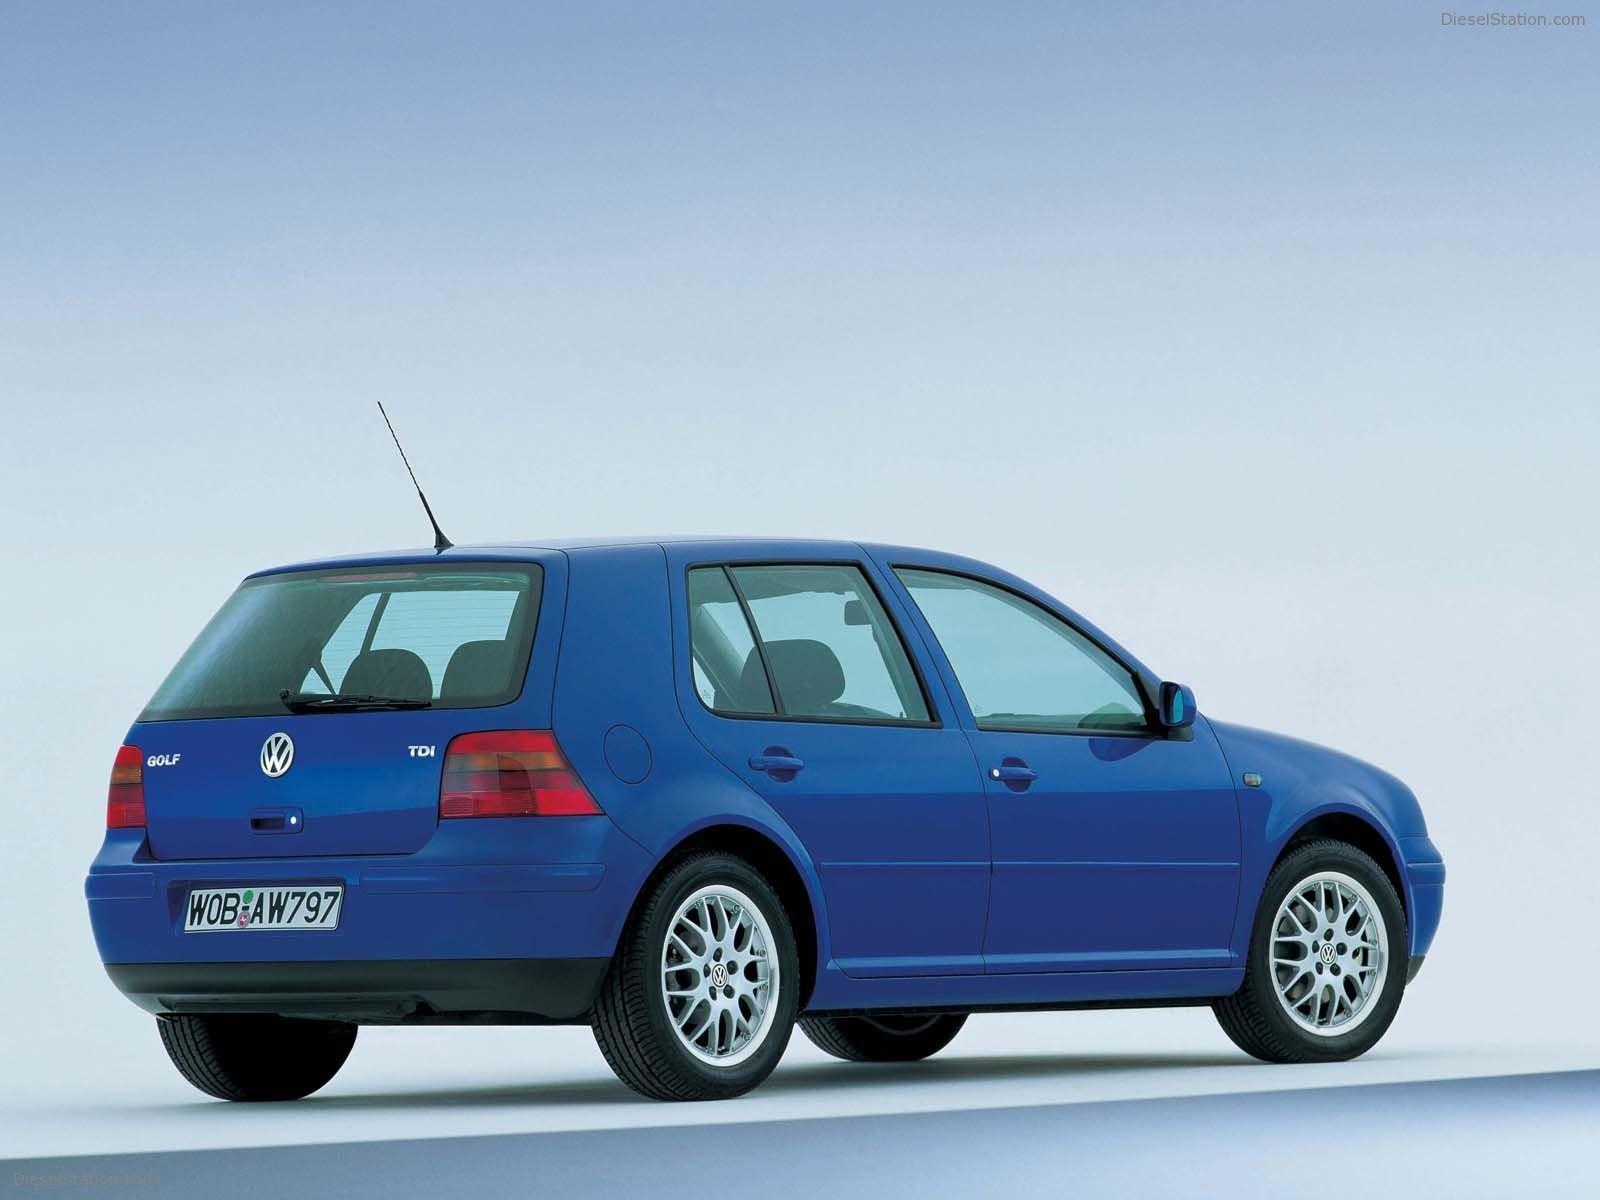 3dtuning of volkswagen golf 4 3 door hatchback 2002. Black Bedroom Furniture Sets. Home Design Ideas